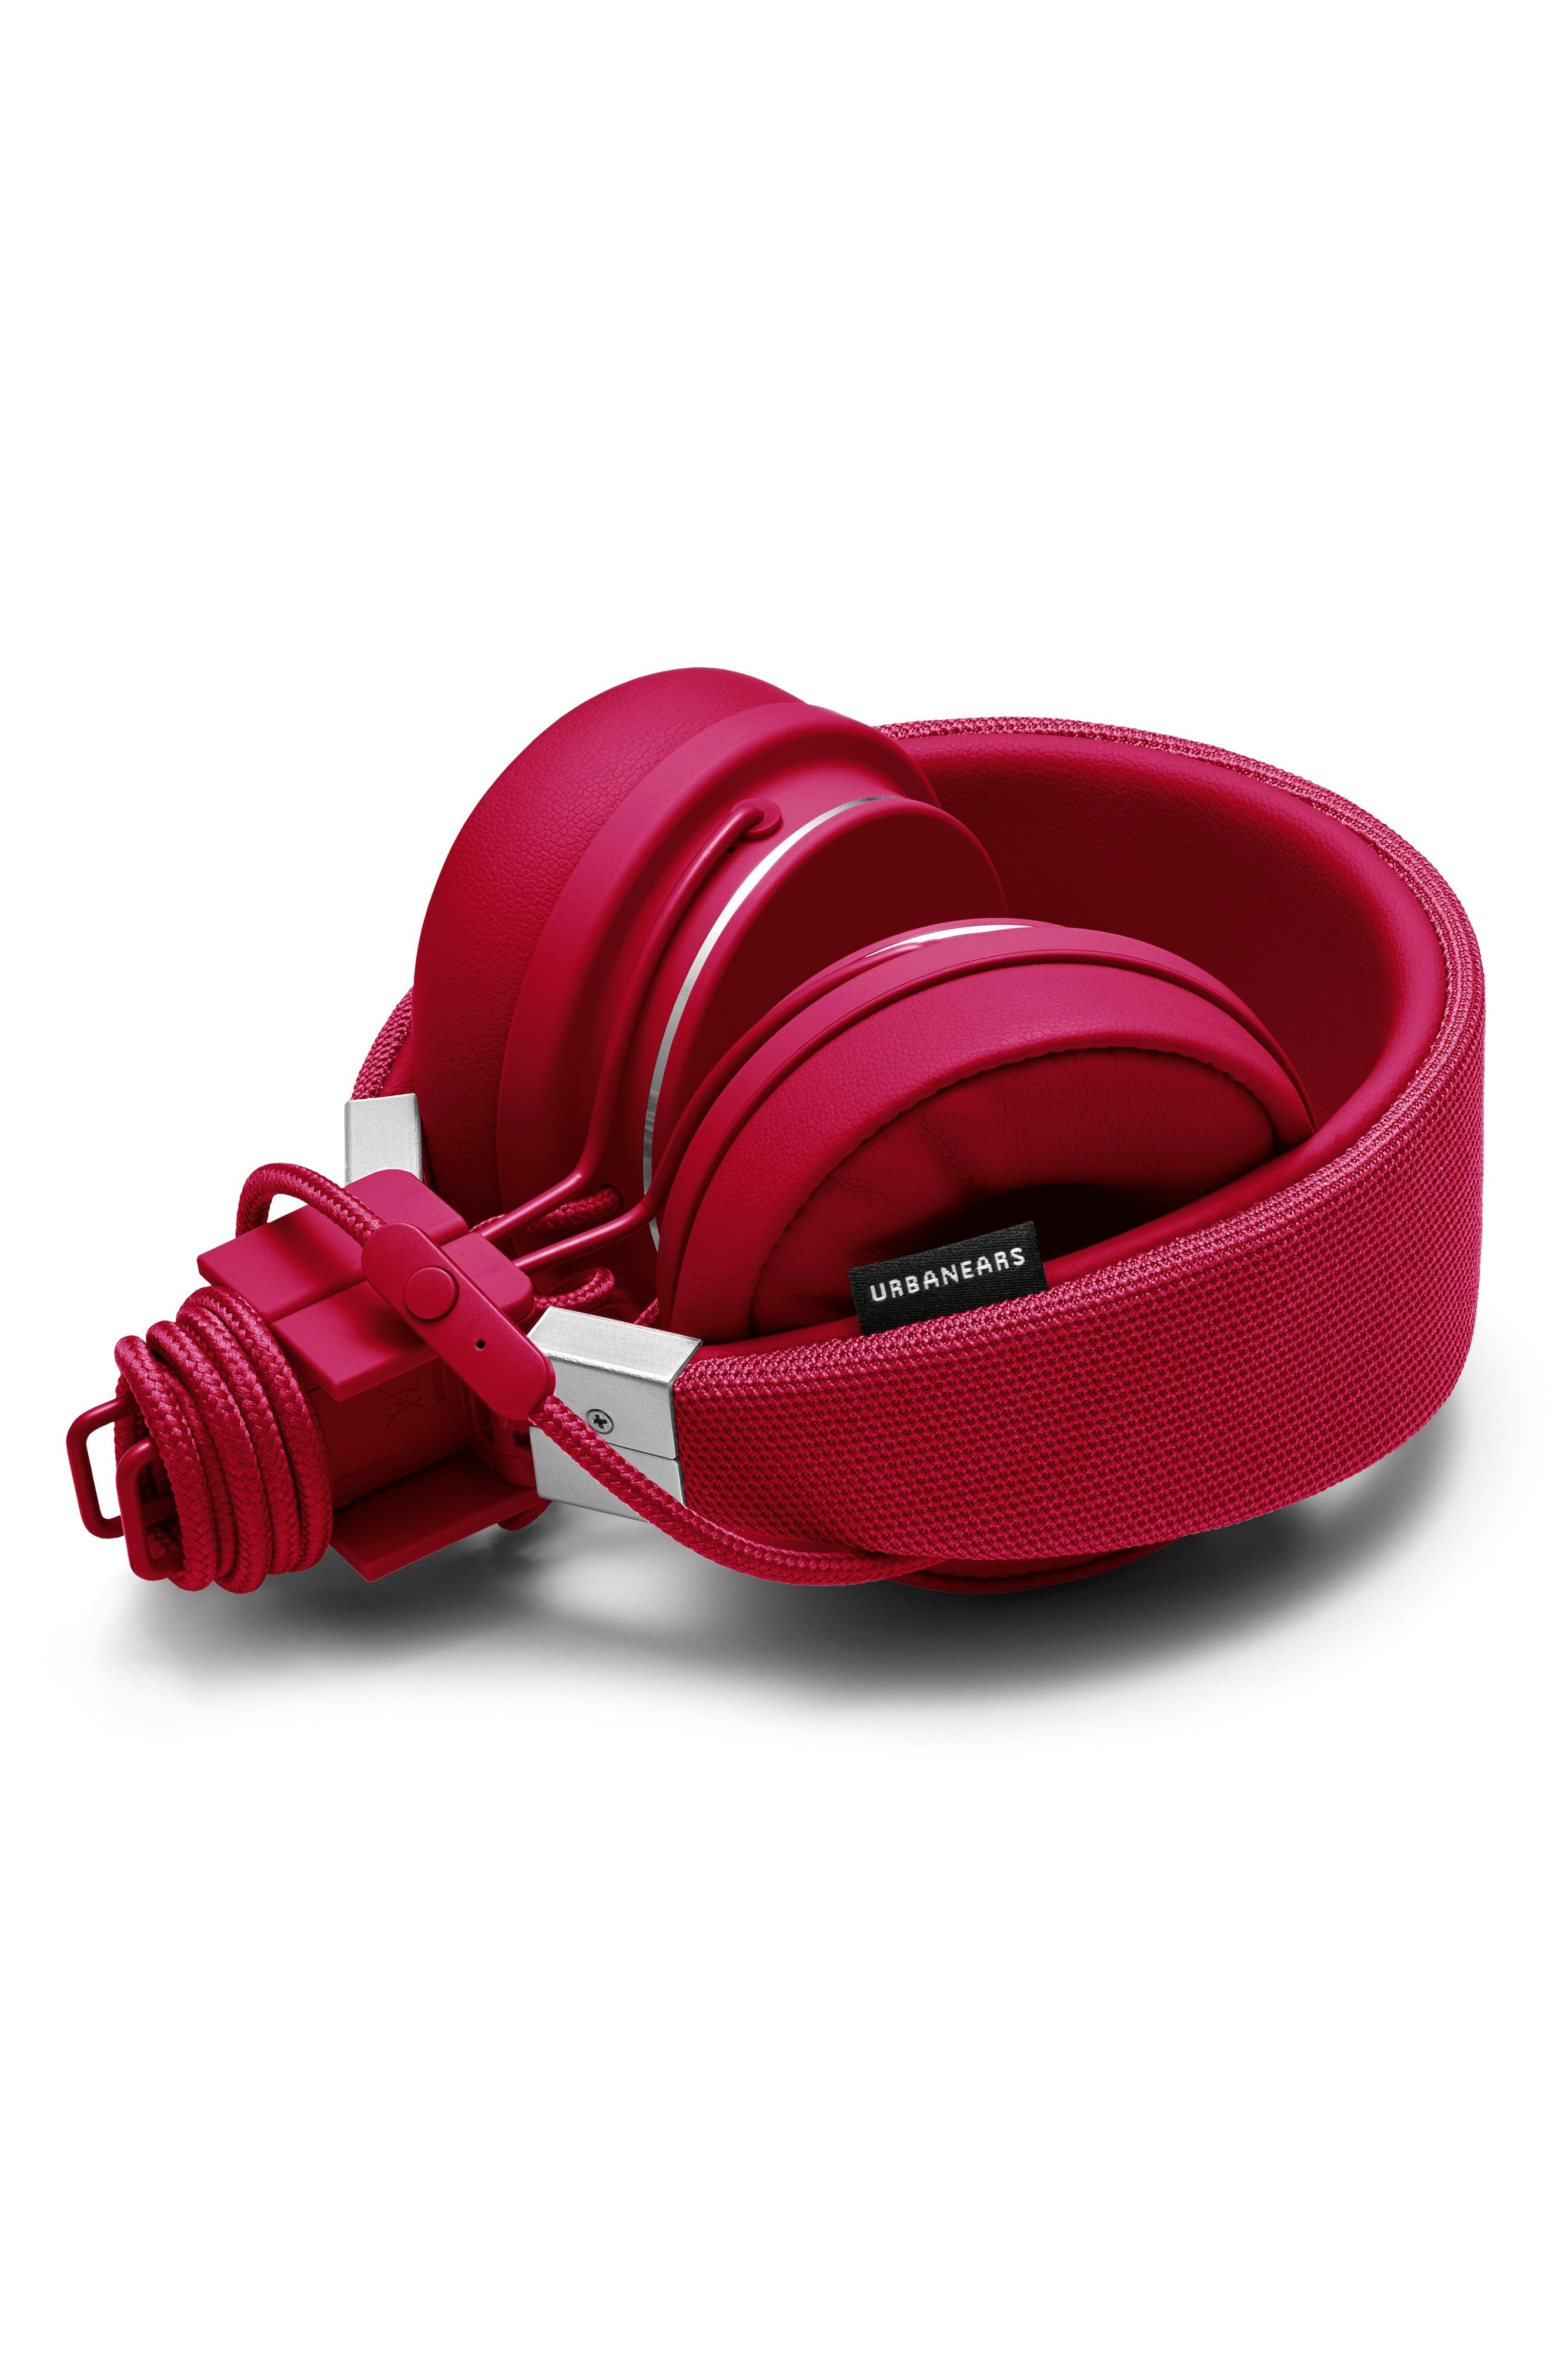 Plattan II On-Ear Headphones,                             Alternate thumbnail 3, color,                             Beryl Red